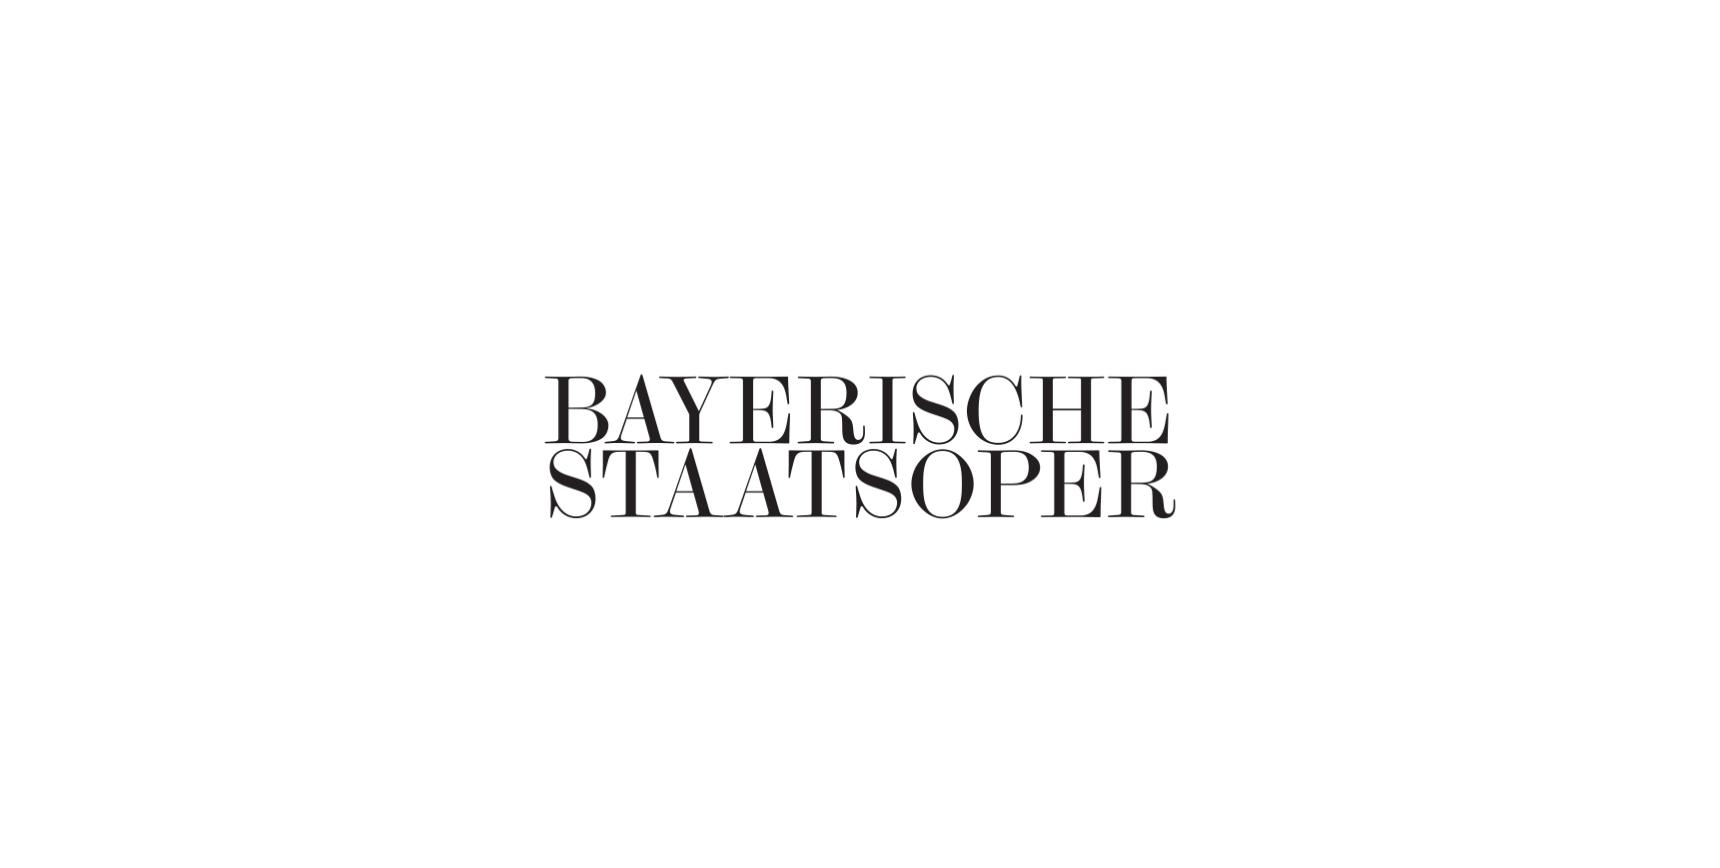 Bayerische Staatsoper announces season 2021/22